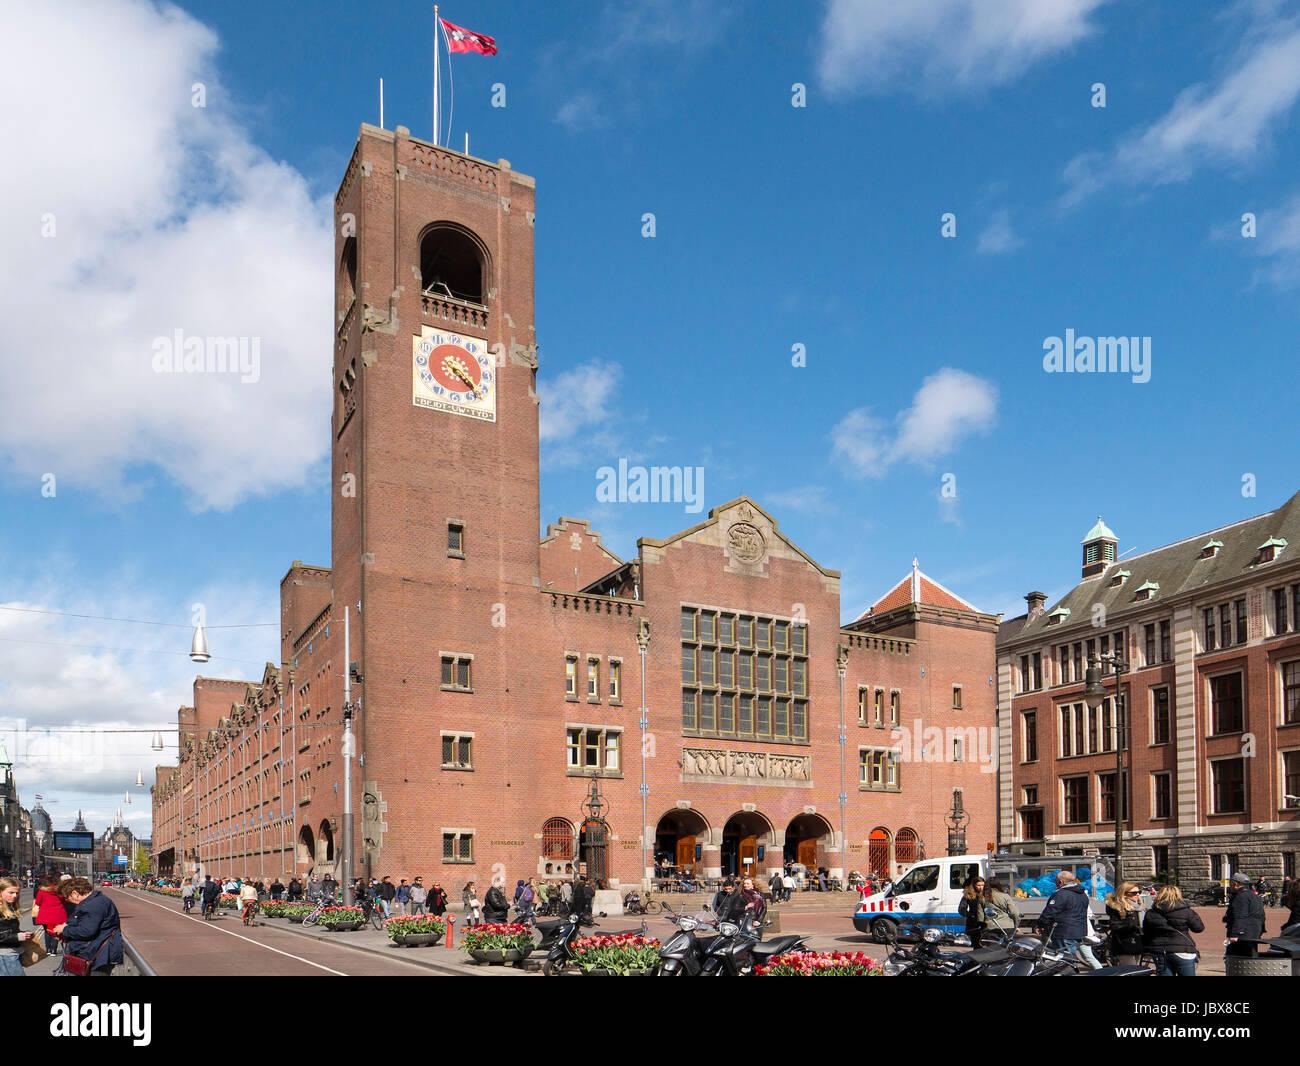 former stock exchange Beurs van Berlage at  Damrak, Amsterdam, Amsterdam, Province North Holland, Netherlands - Stock Image